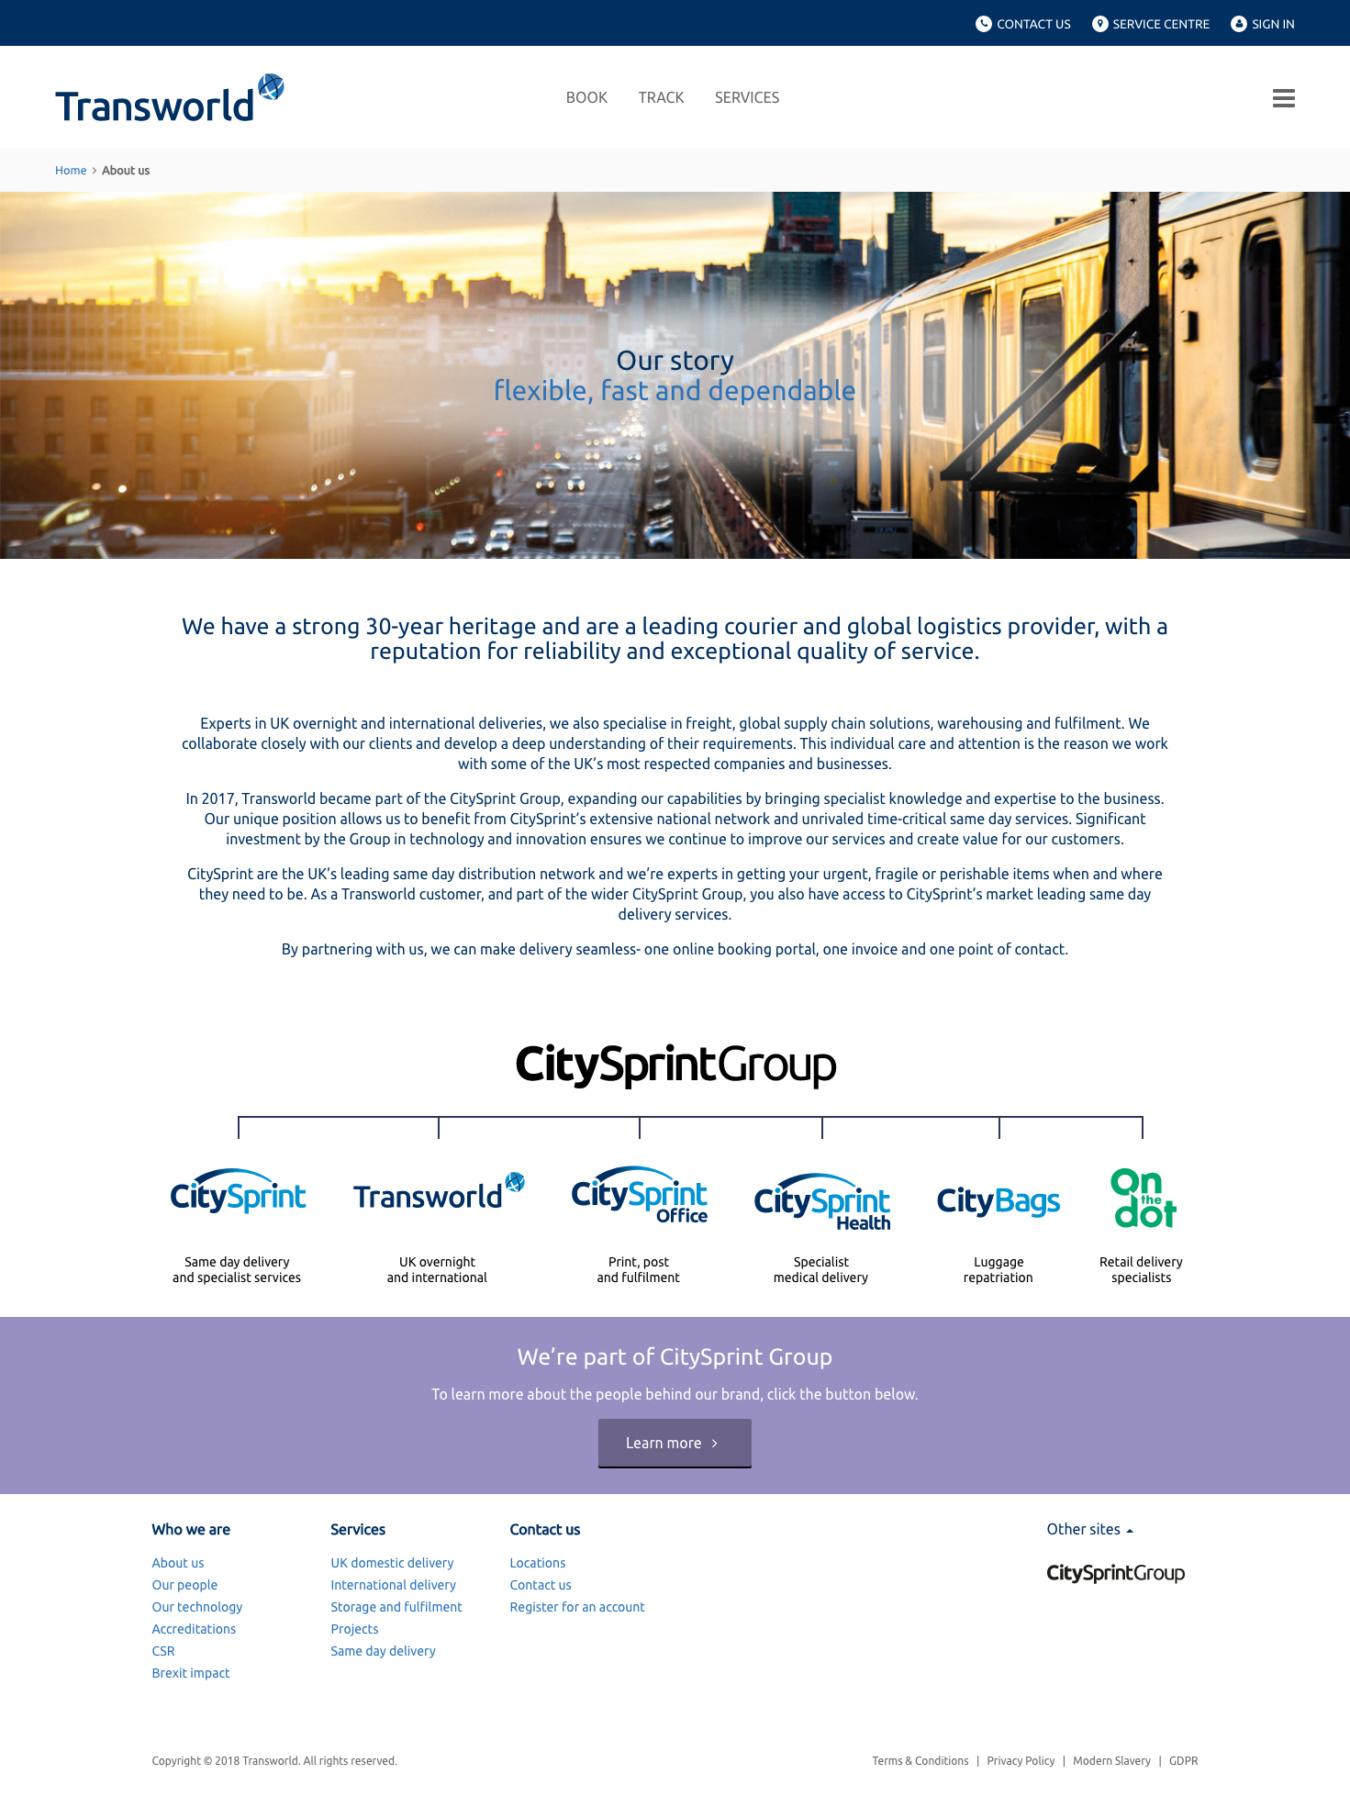 Transworld Couriers - Bespoke Website Development